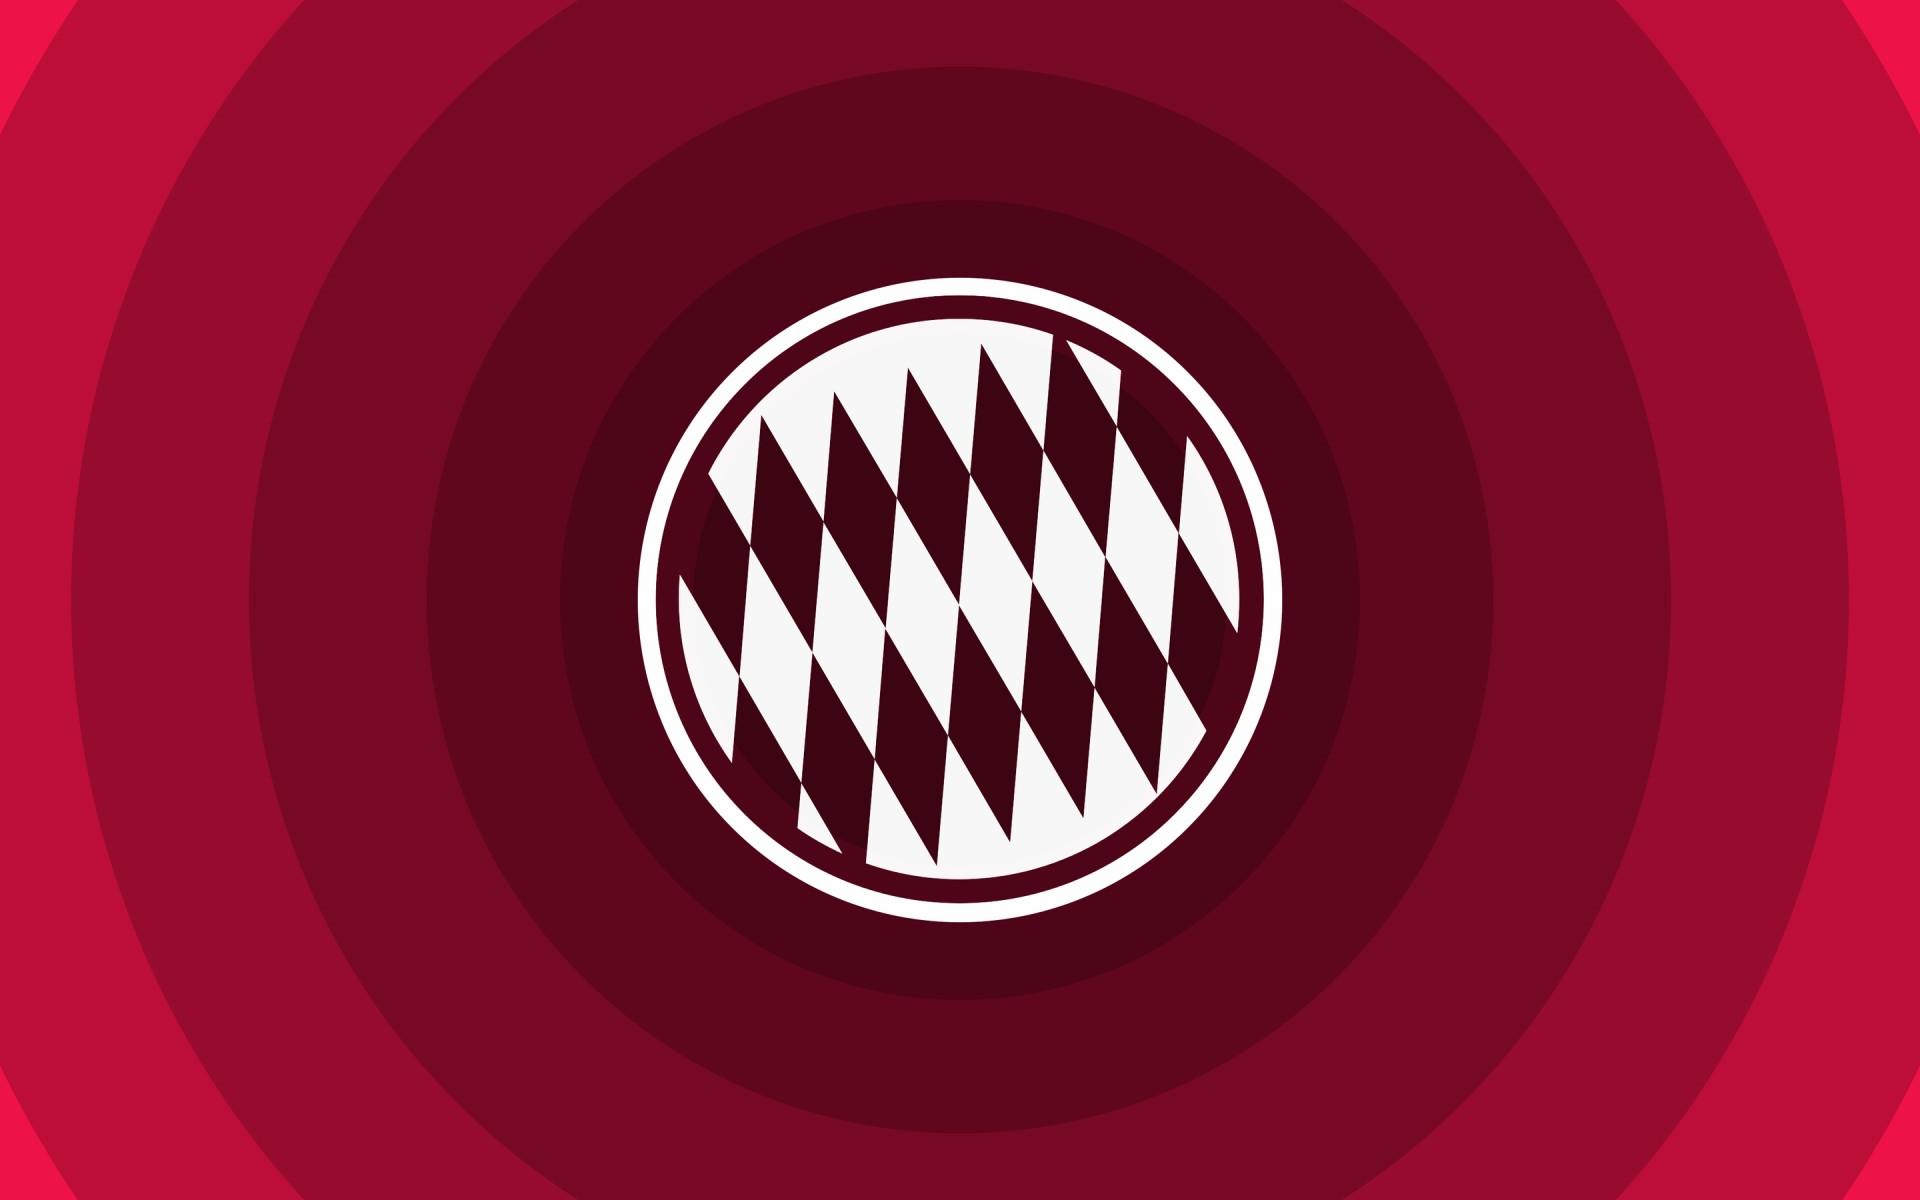 Fc bayern munich minimal logo desktop wallpapers for free voltagebd Gallery